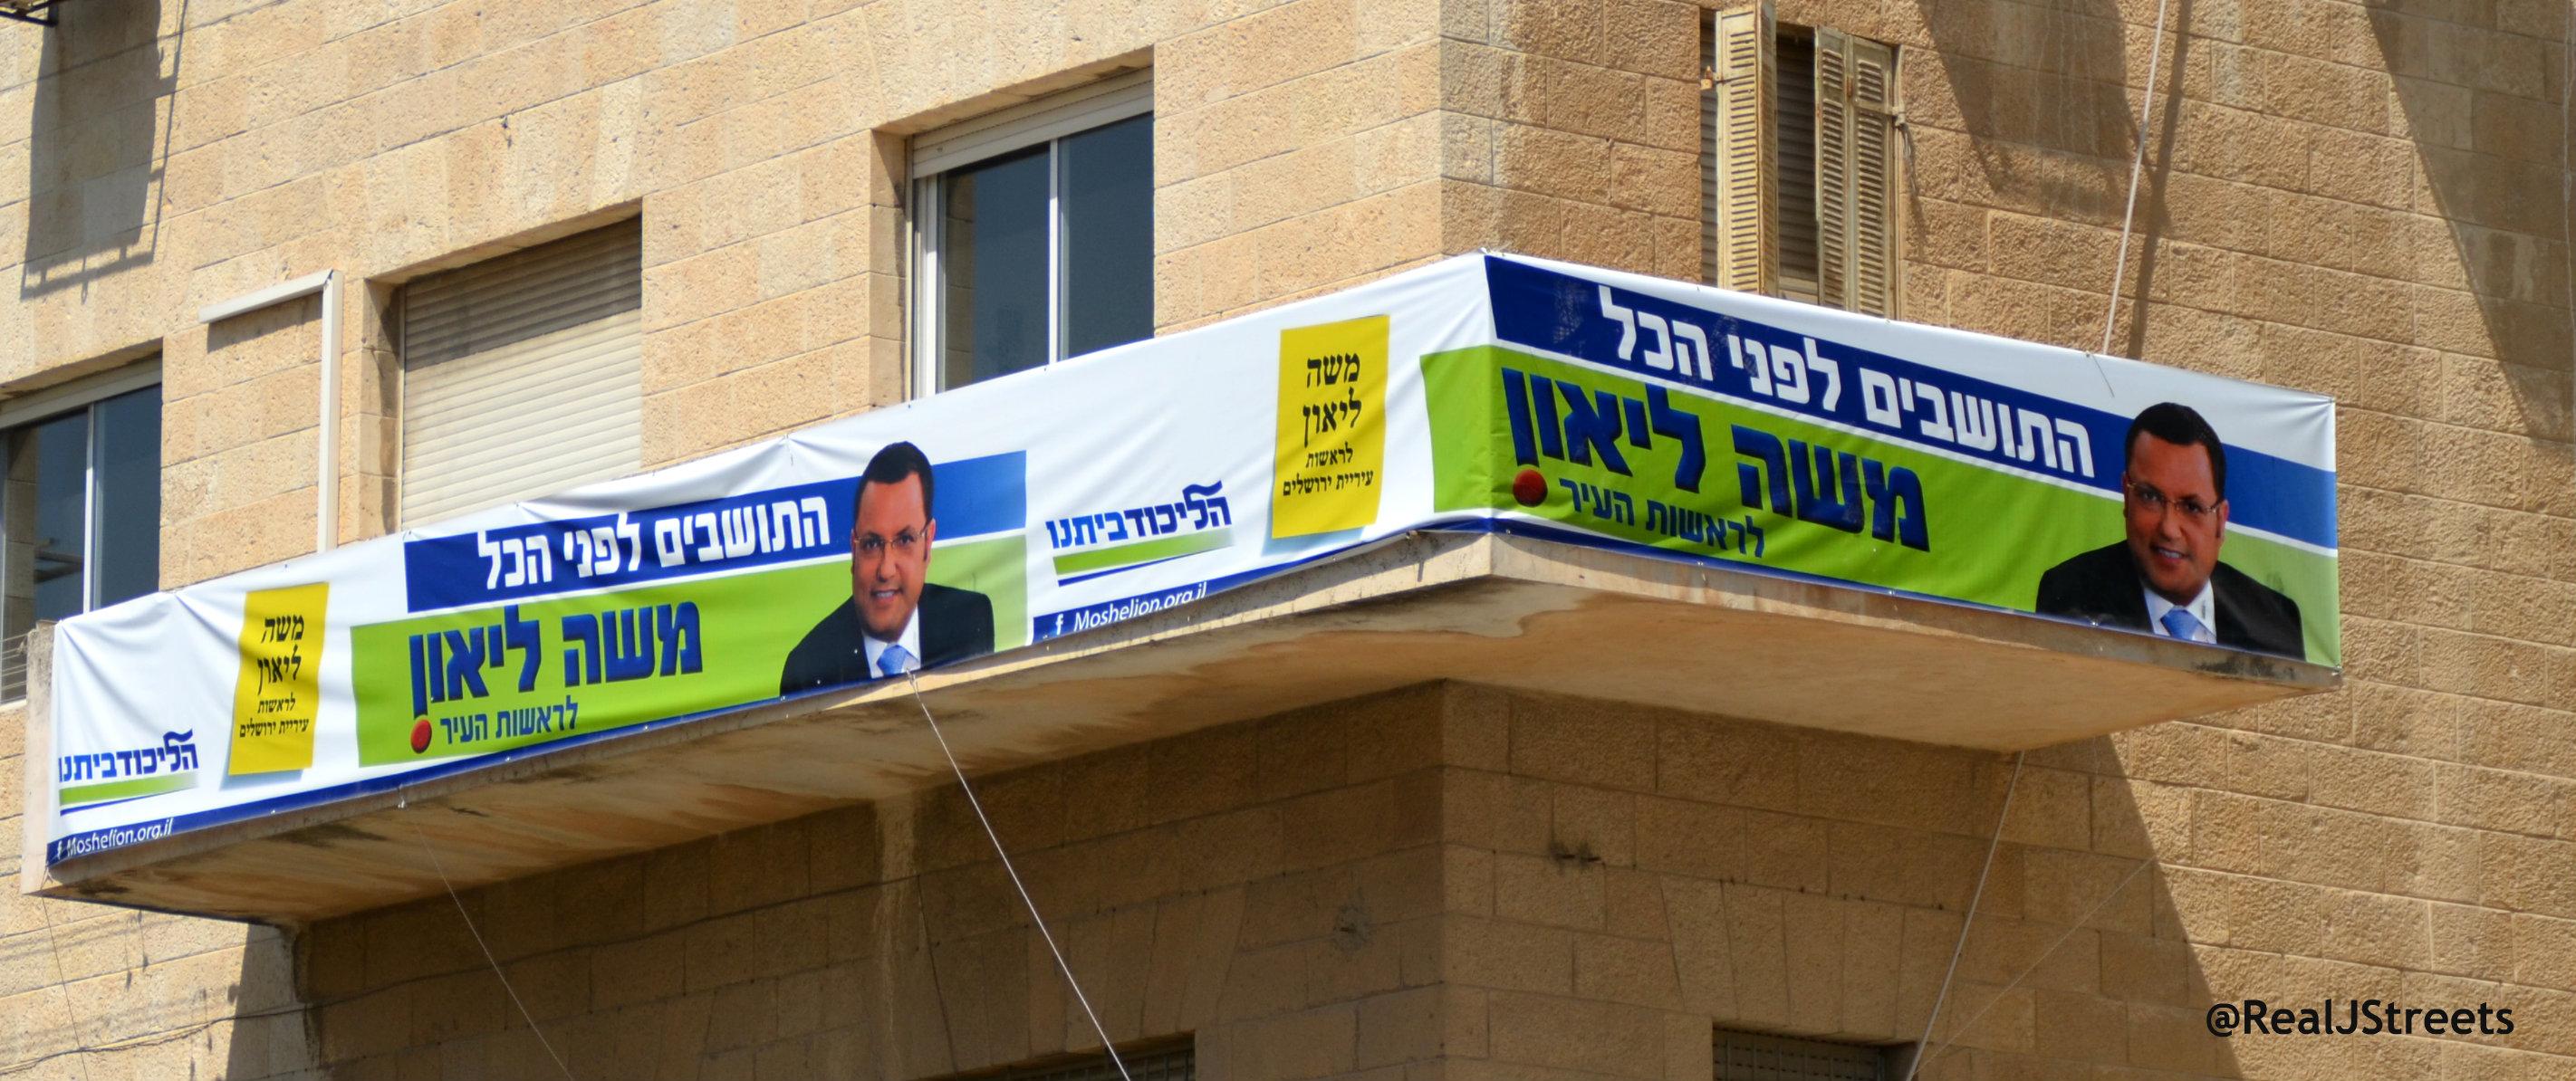 Jerusalem elections image, Mosh Lion